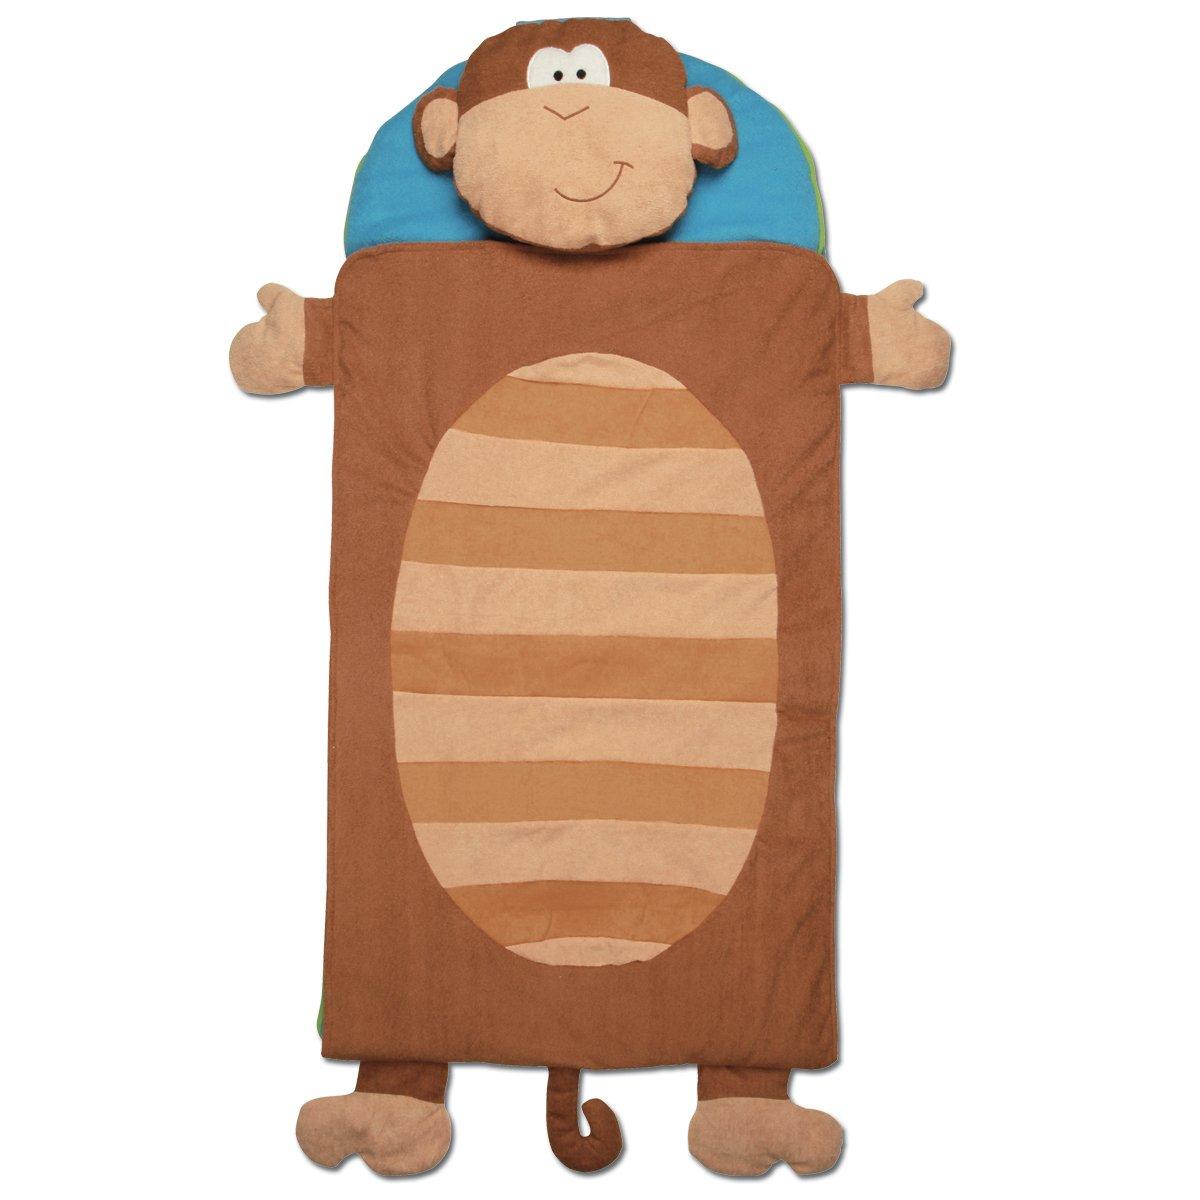 Stephen Joseph Character Nap Mat, Monkey by Stephen Joseph (Image #1)